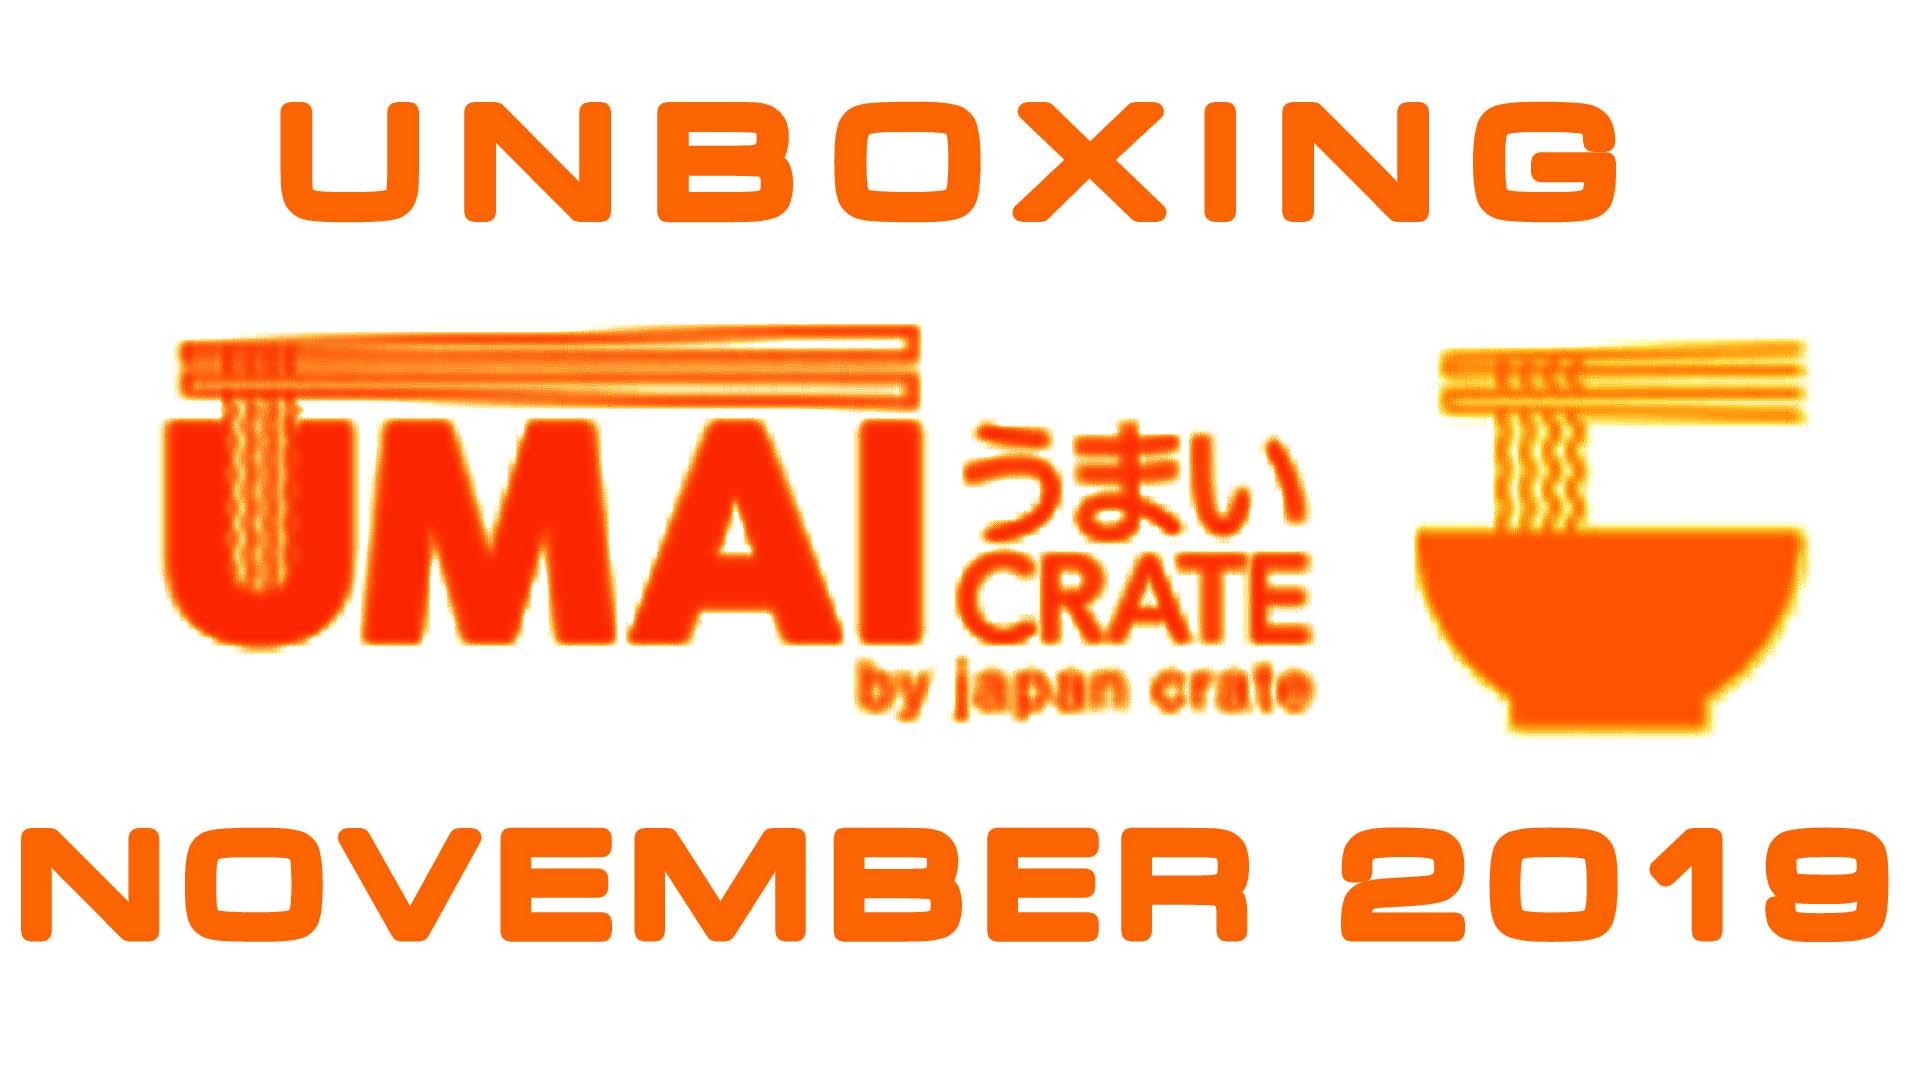 Umai Crate - Japanese Ramen Noodles Subscription Box - November 2019 Unboxing